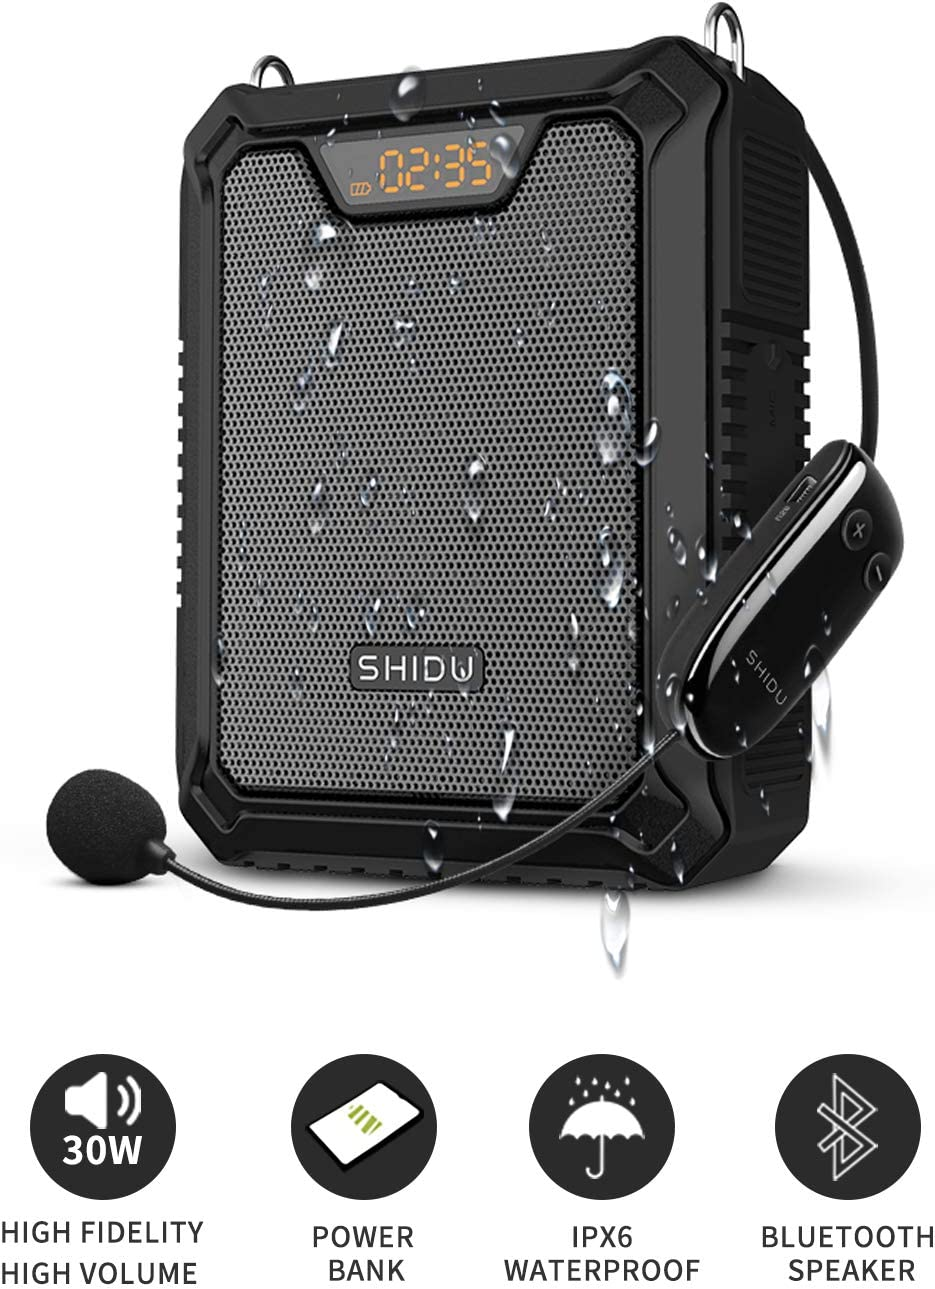 SHIDU 30W UHF IPX6 Bluetooth Amplificador de voz, Amplificador de voz personal con micrófono inalámbrico Auricular Altavoz portátil a prueba de agua Sistema de PA recargable Banco de energía